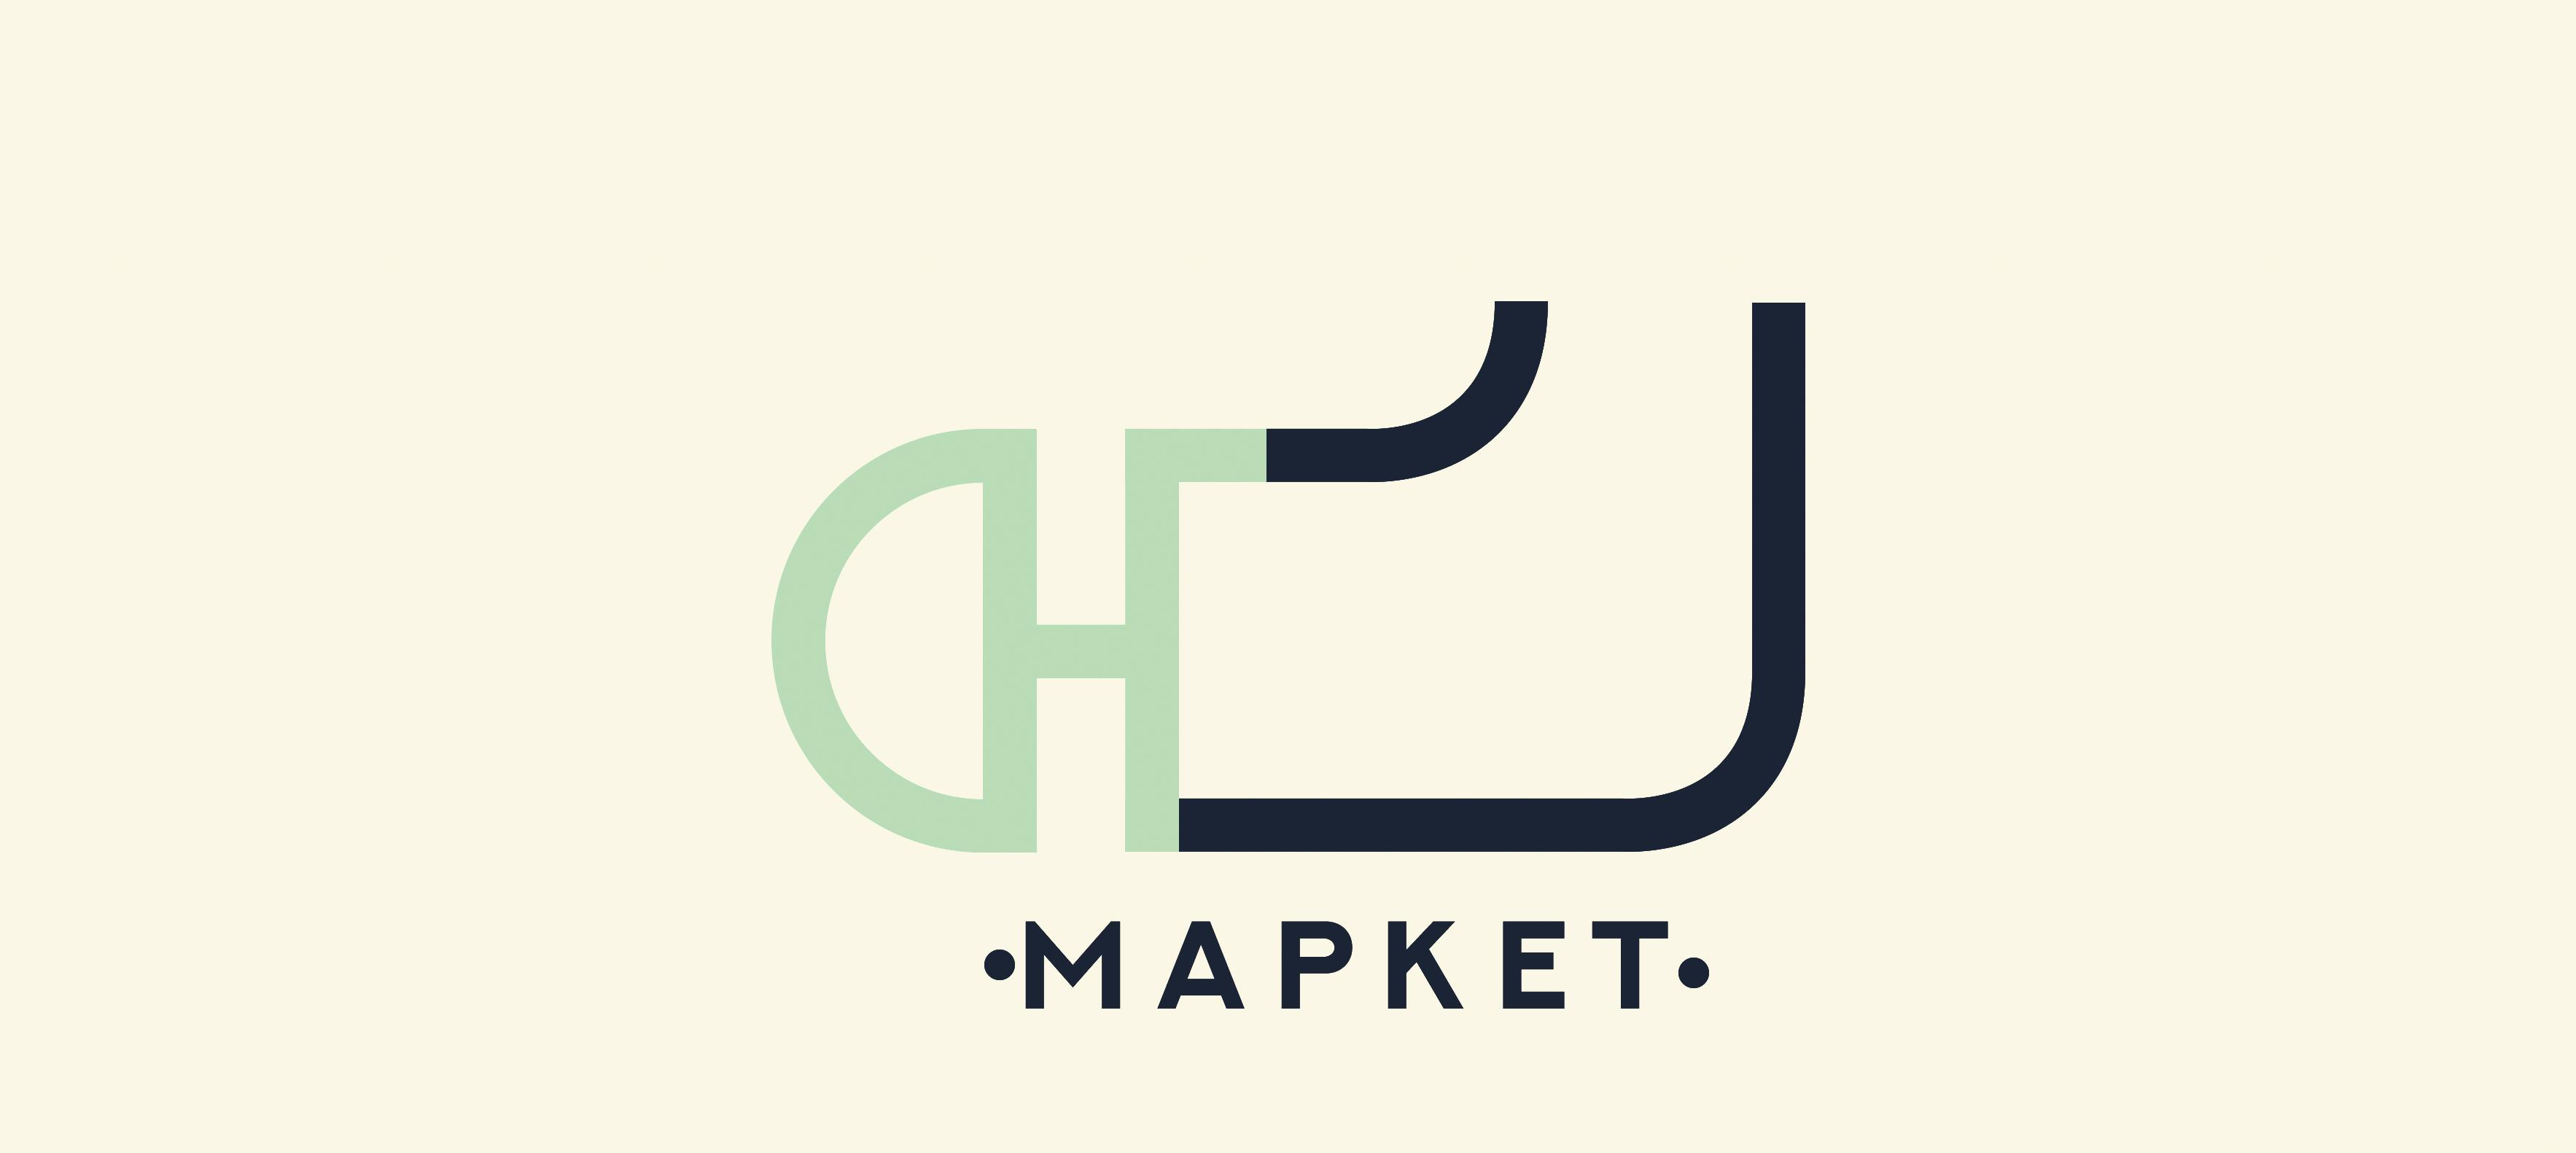 Объявляется конкурс на создание логотипа ИМ обуви фото f_7625a117a8122a49.jpg